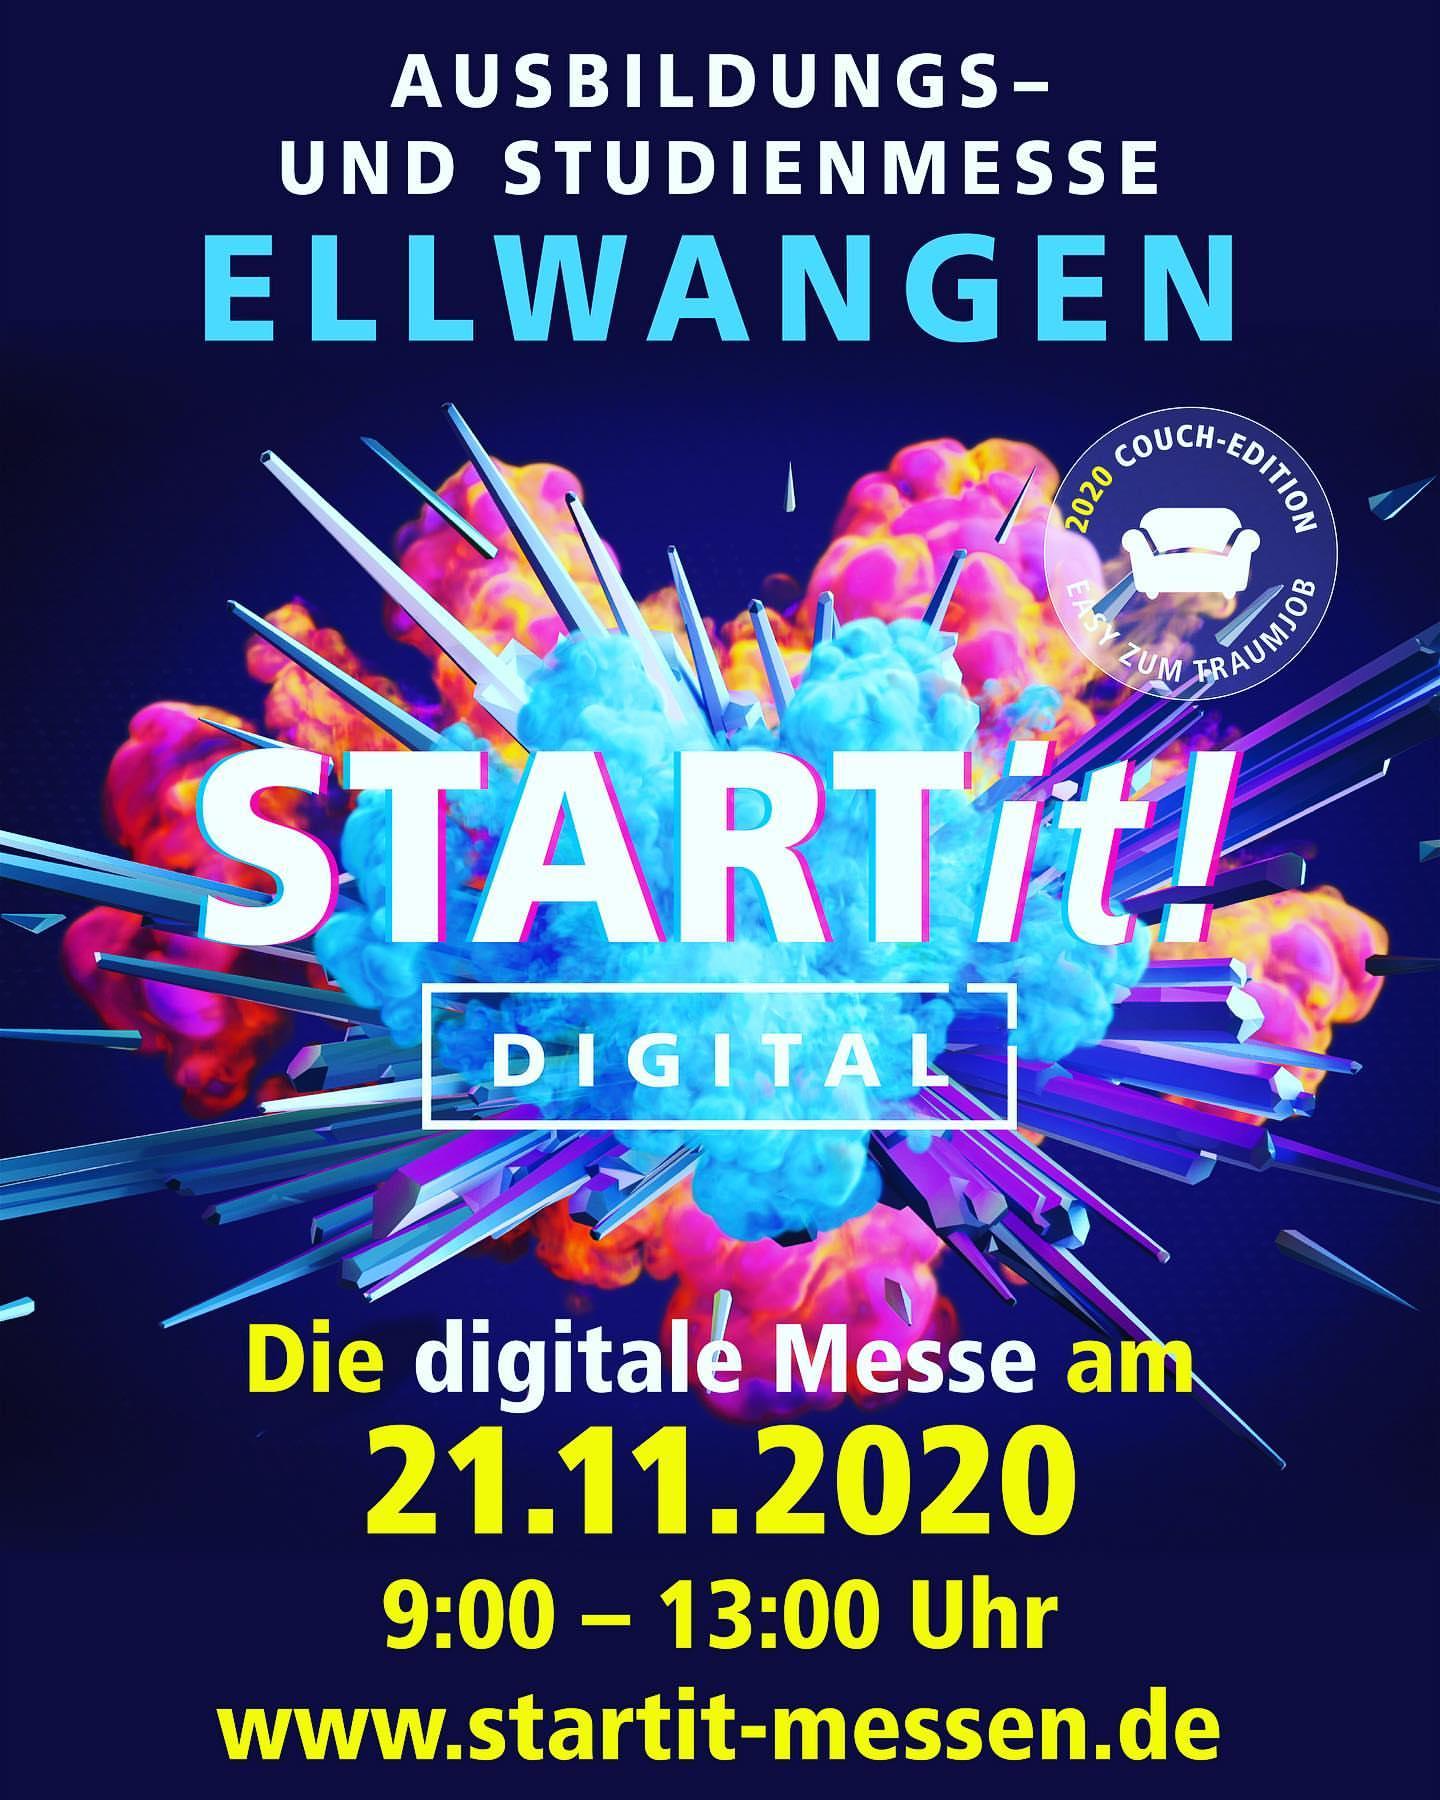 Digitale Ausbildungsmesse am 21.11.2020